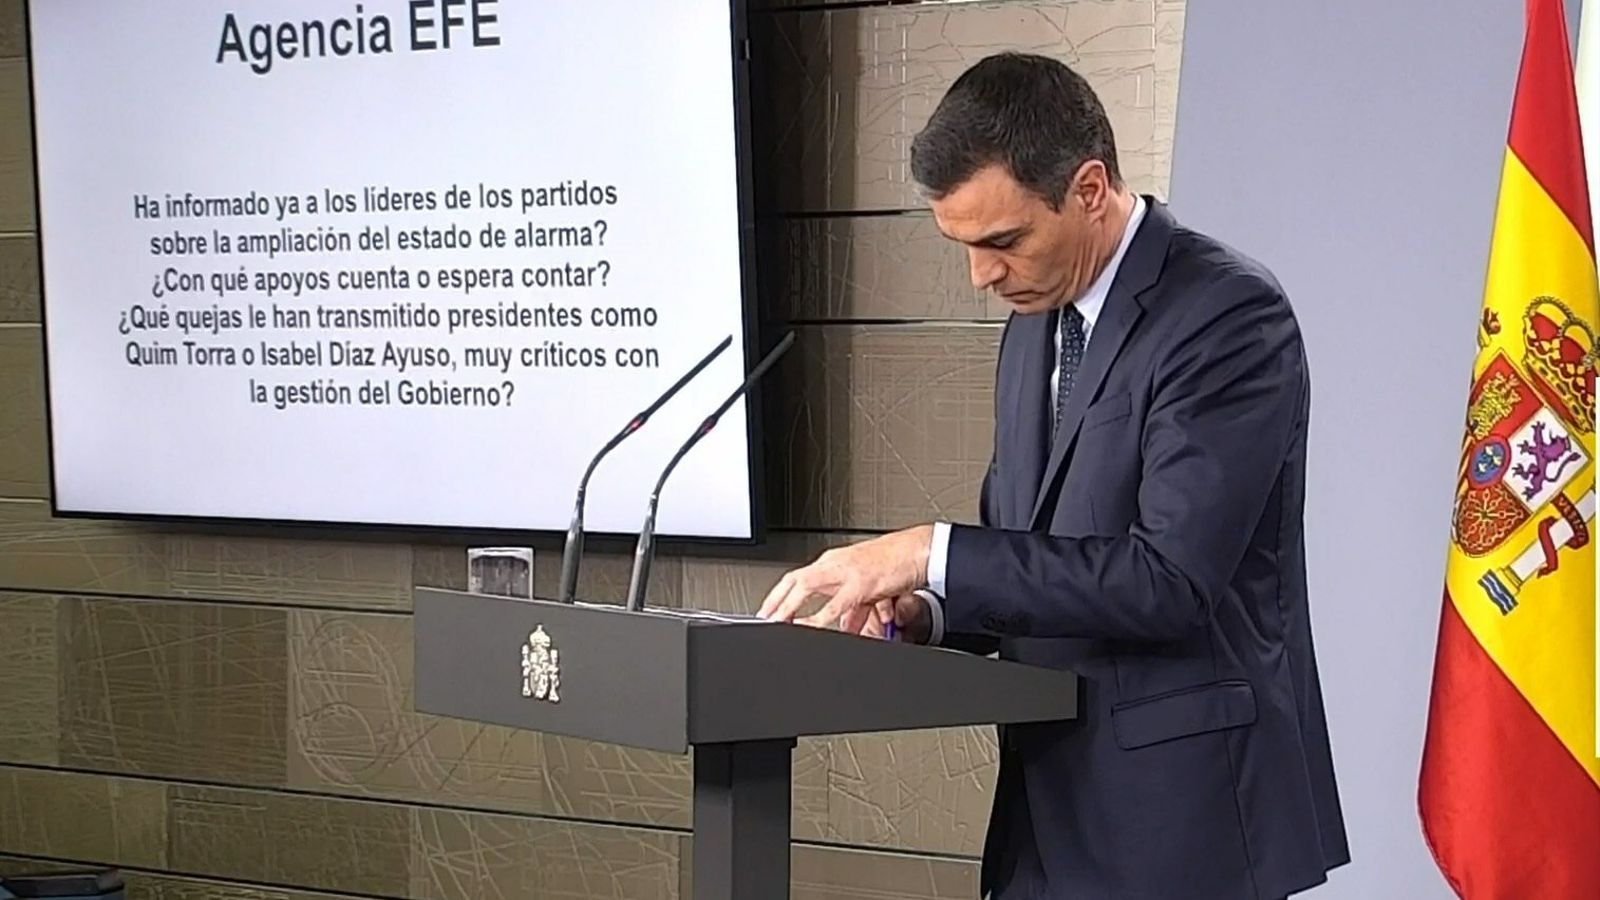 Pregunta en roda de premsa al president Pedro Sanchez de l'agencia EFE